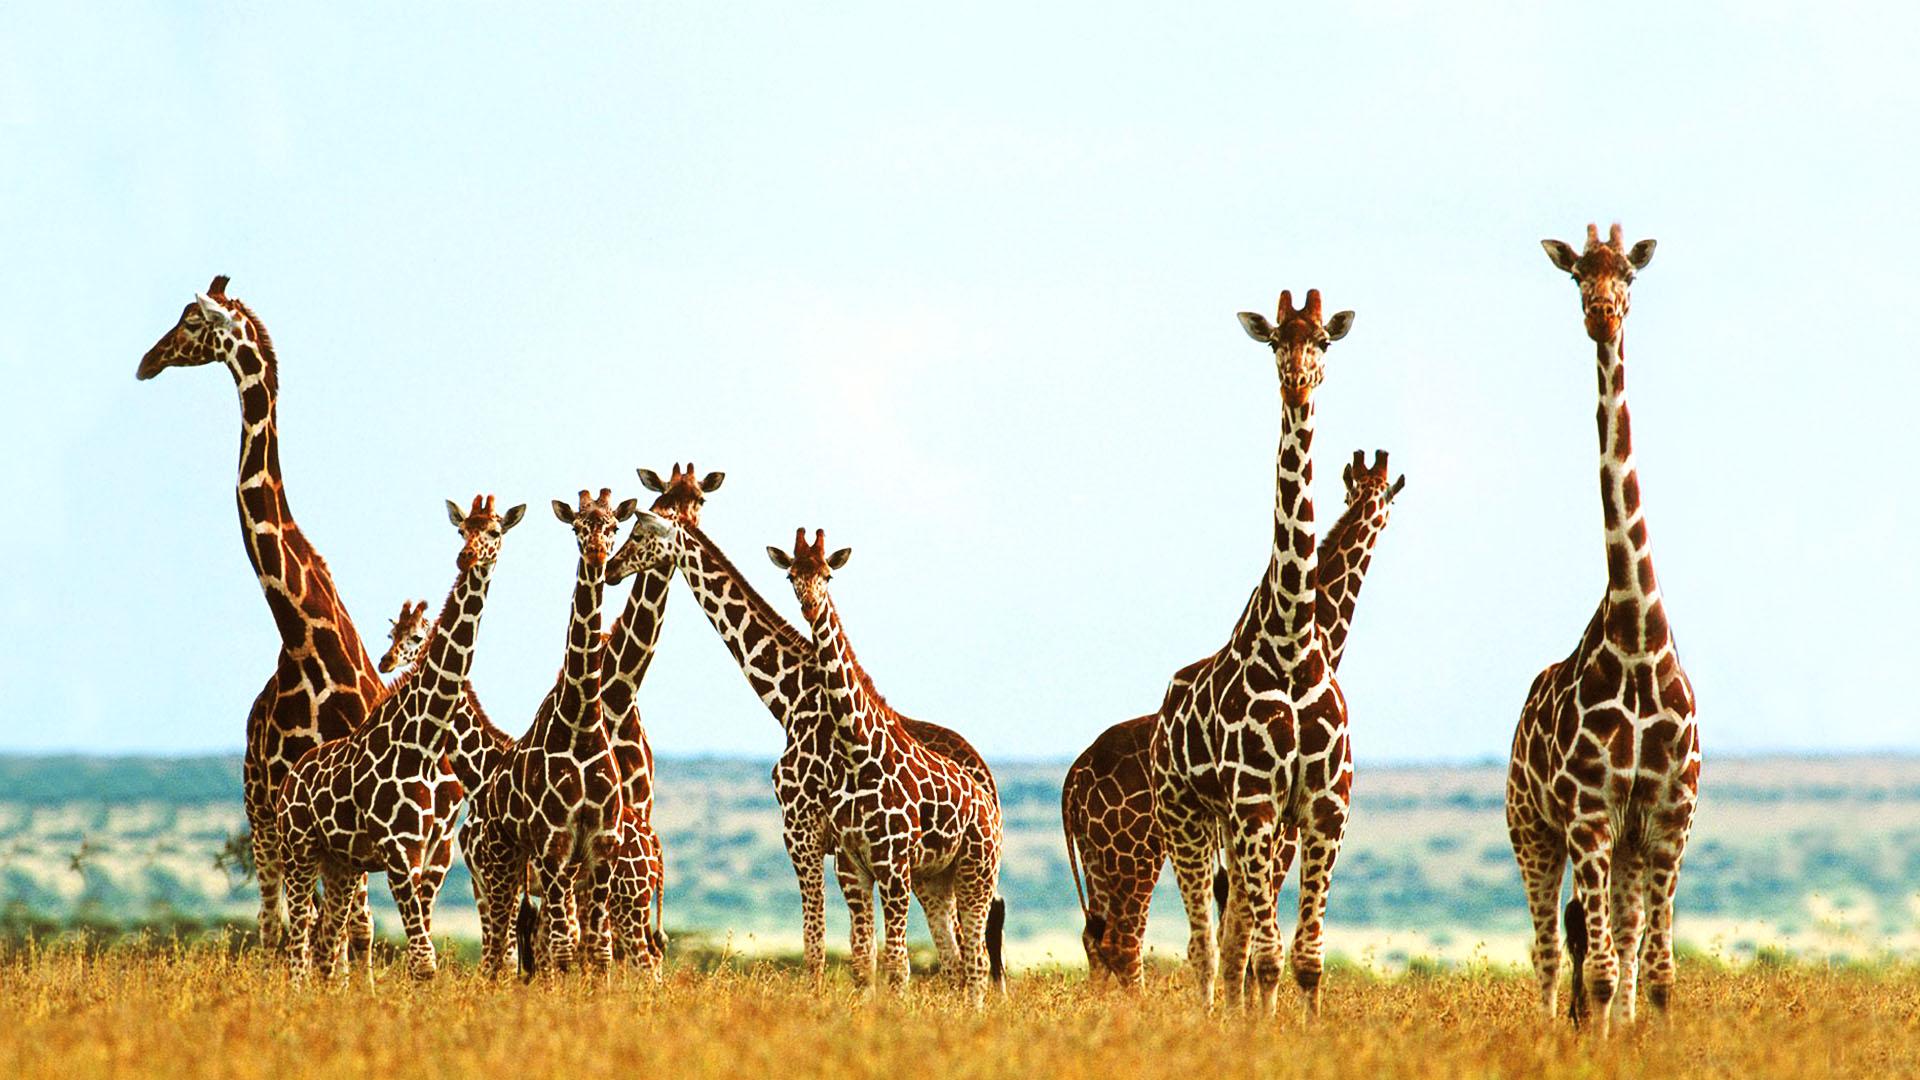 giraffe wallpapers free